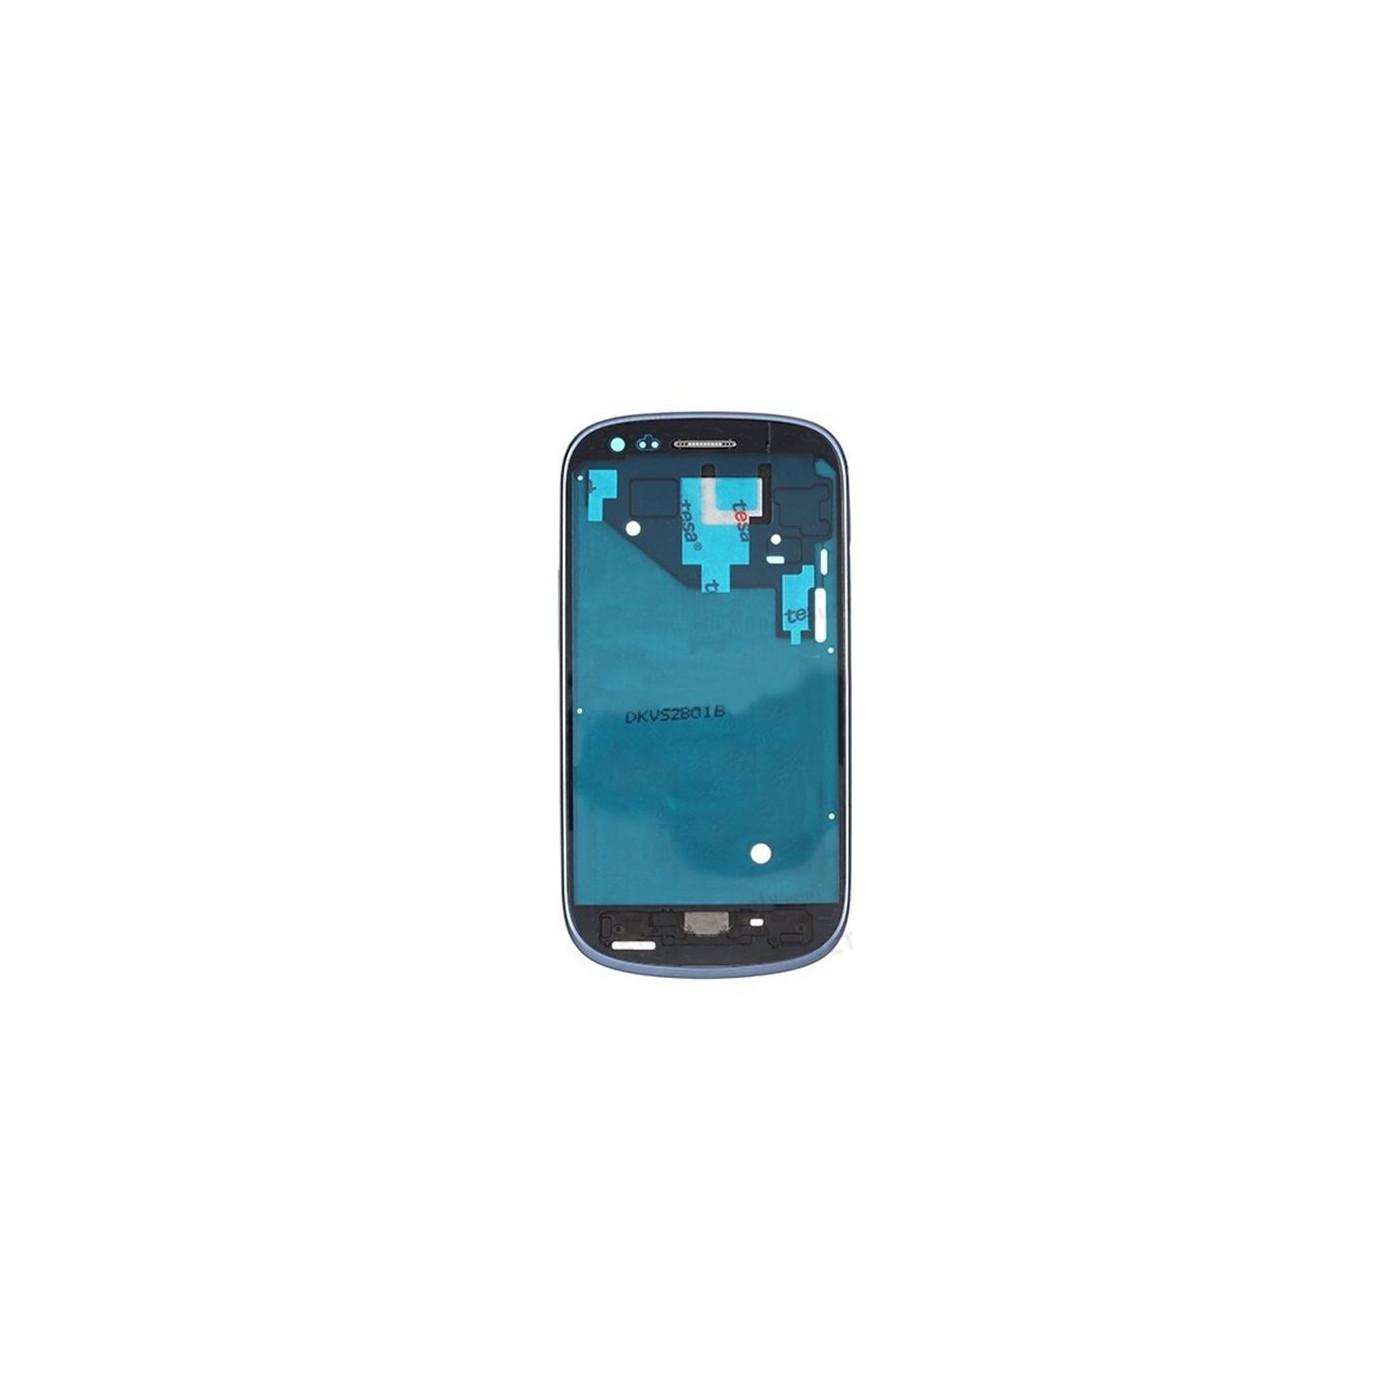 Rahmen Rahmen Körper Rahmen Rahmen für Samsung Galaxy S3 Mini I8190 Blau